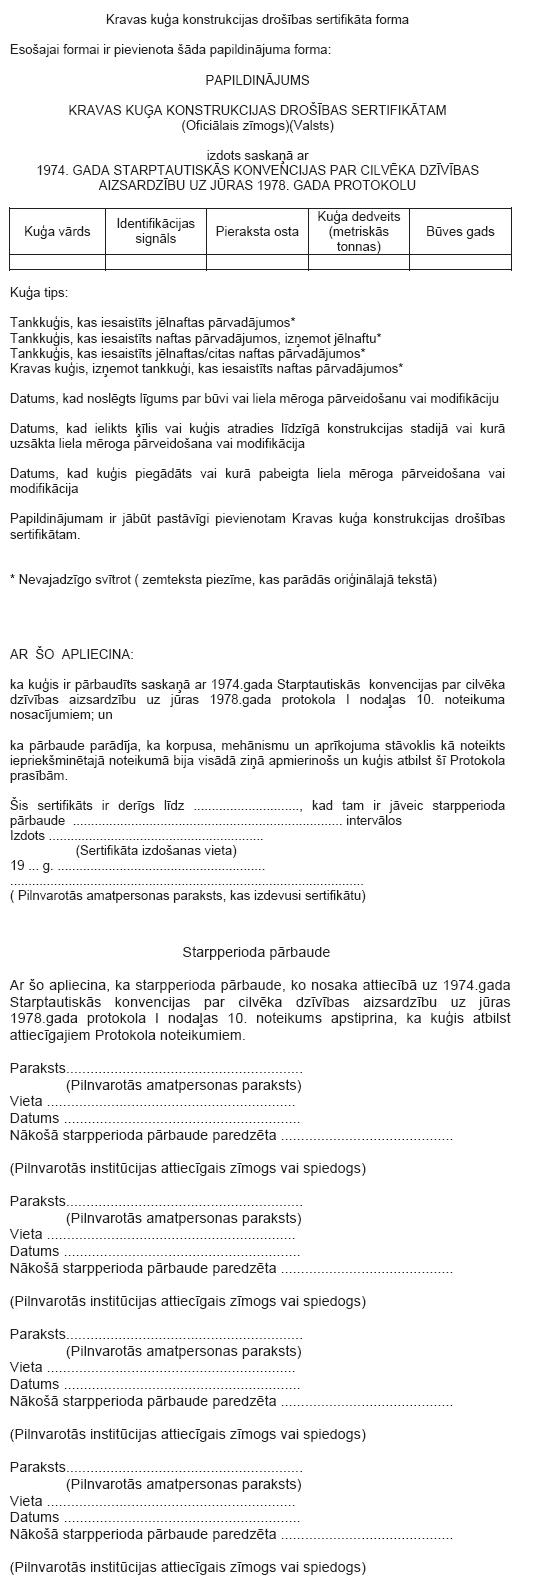 A21.PNG (141329 bytes)